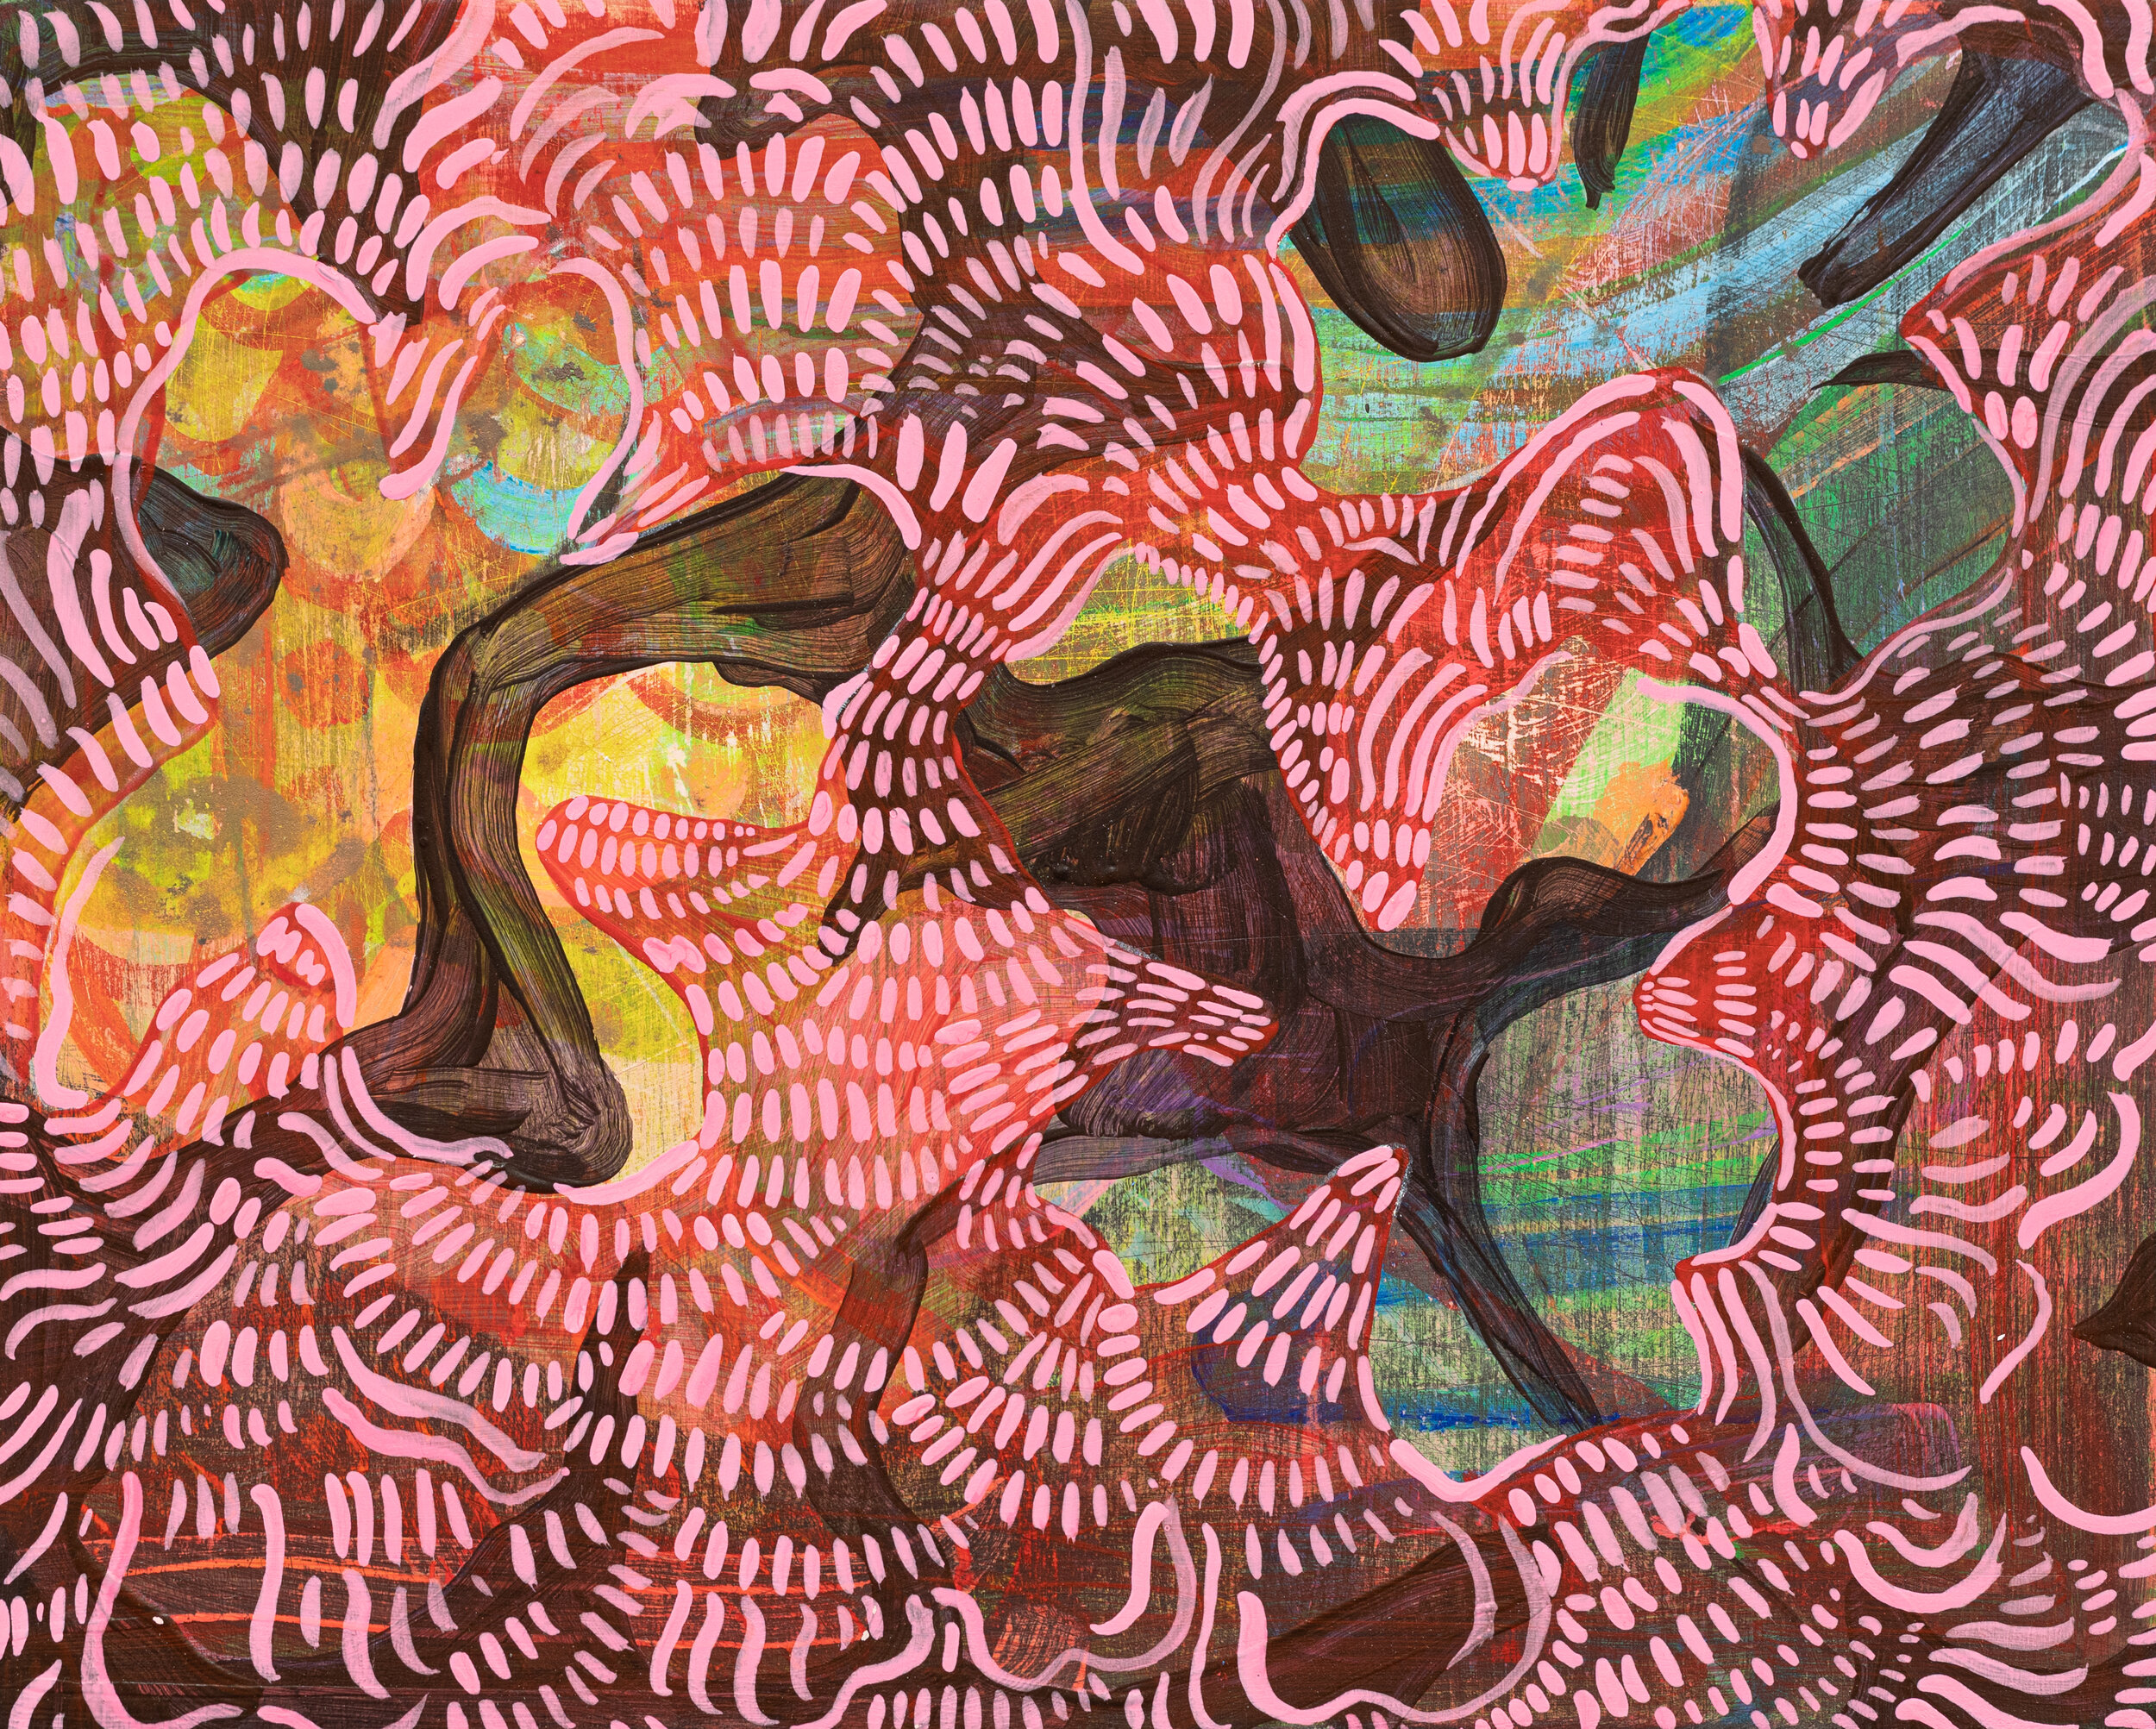 Wylie Garcia, Little Building Block, 2019, Acrylic on Birch Panel, 8x10, 425.jpg